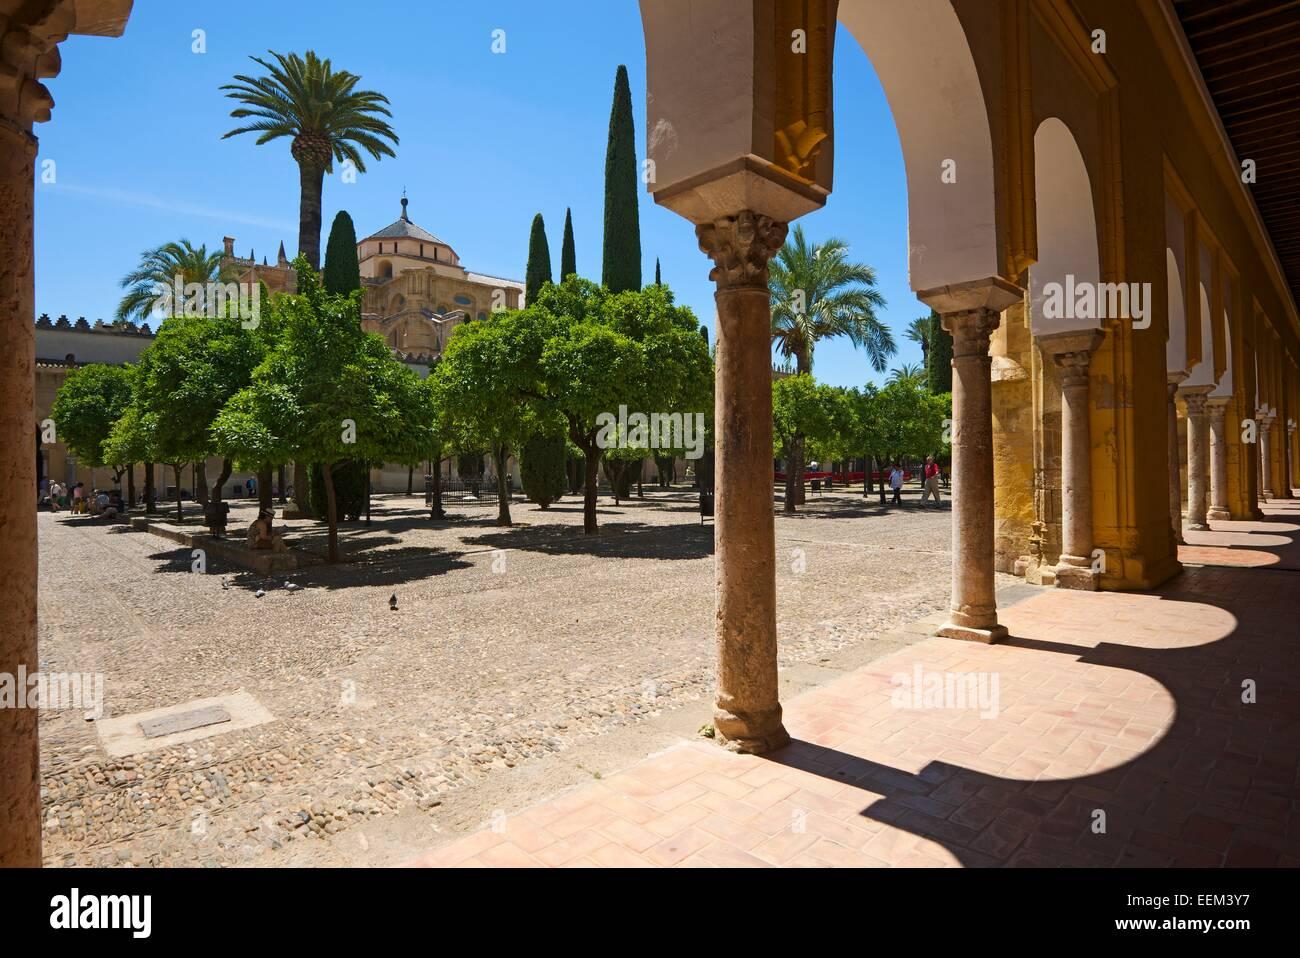 Courtyard and cloisters of the Mezquita de Cordoba, Cordoba, Andalucía, Spain Stock Photo